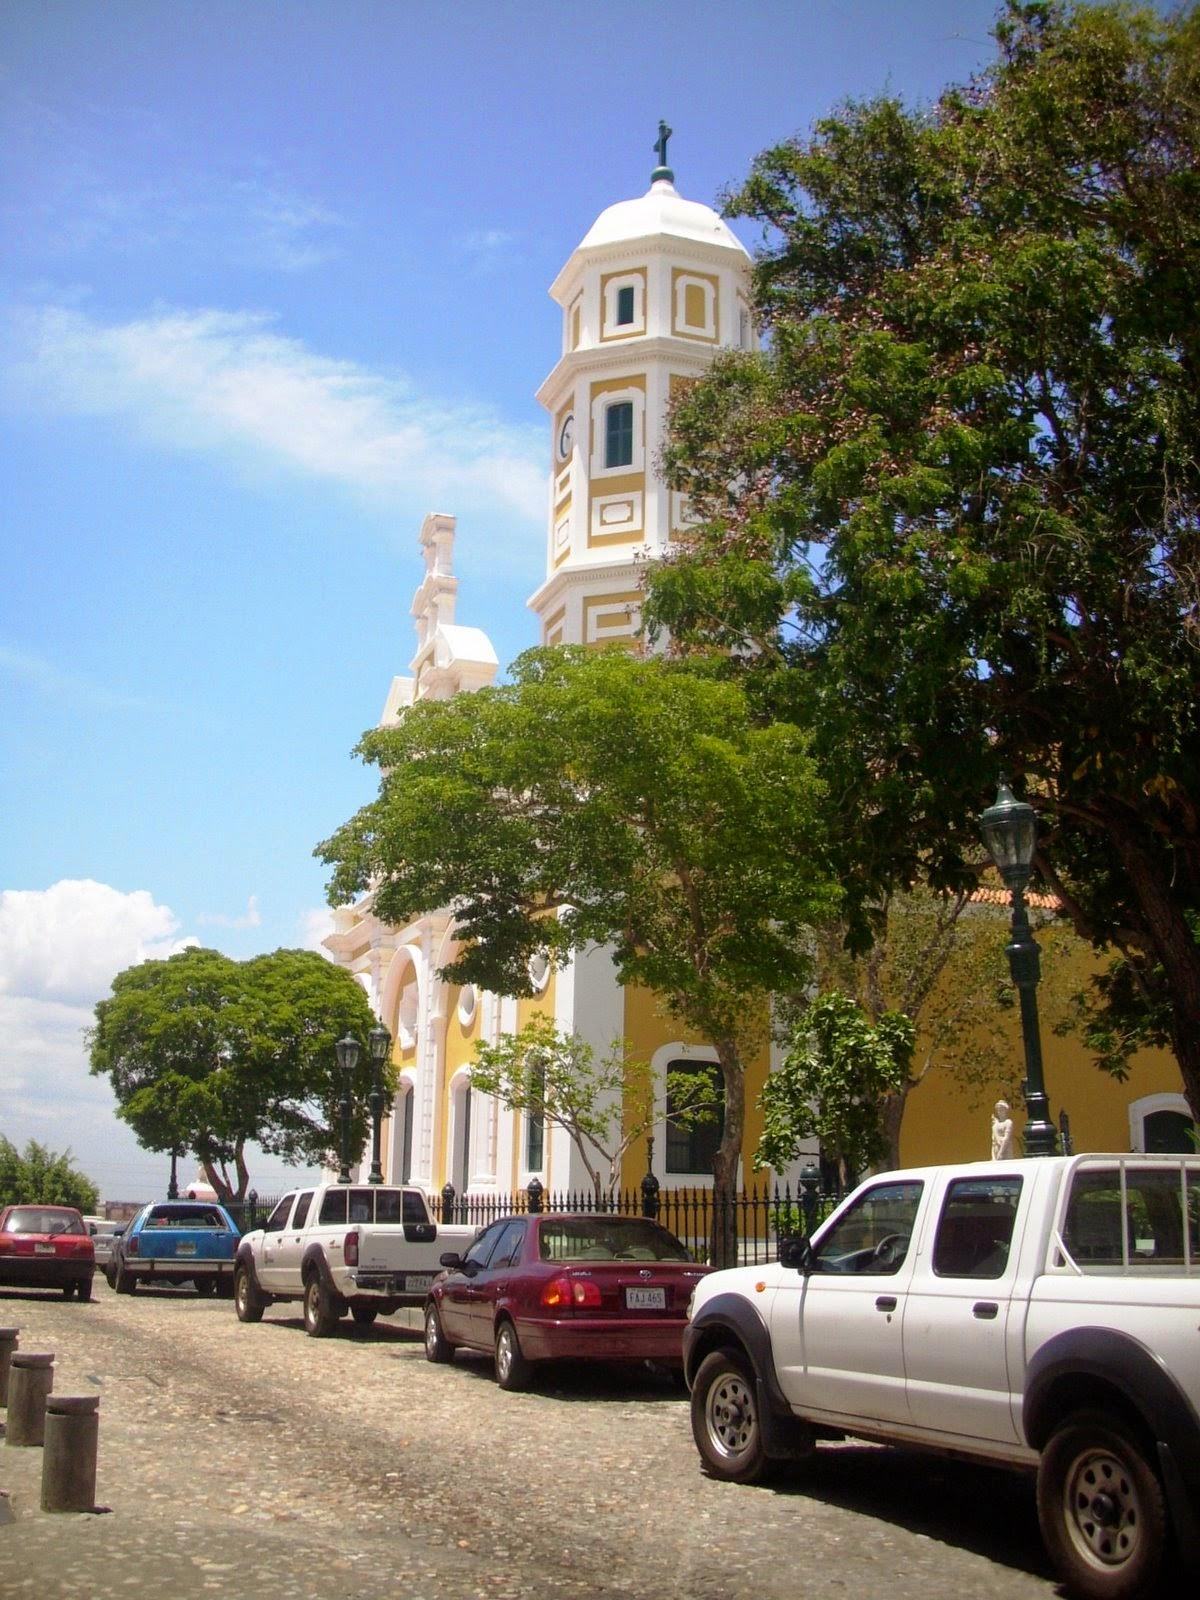 http://hemisferiosurguayana.blogspot.com/2009/05/ciudad-bolivar-tres-imagenes-del-casco.html